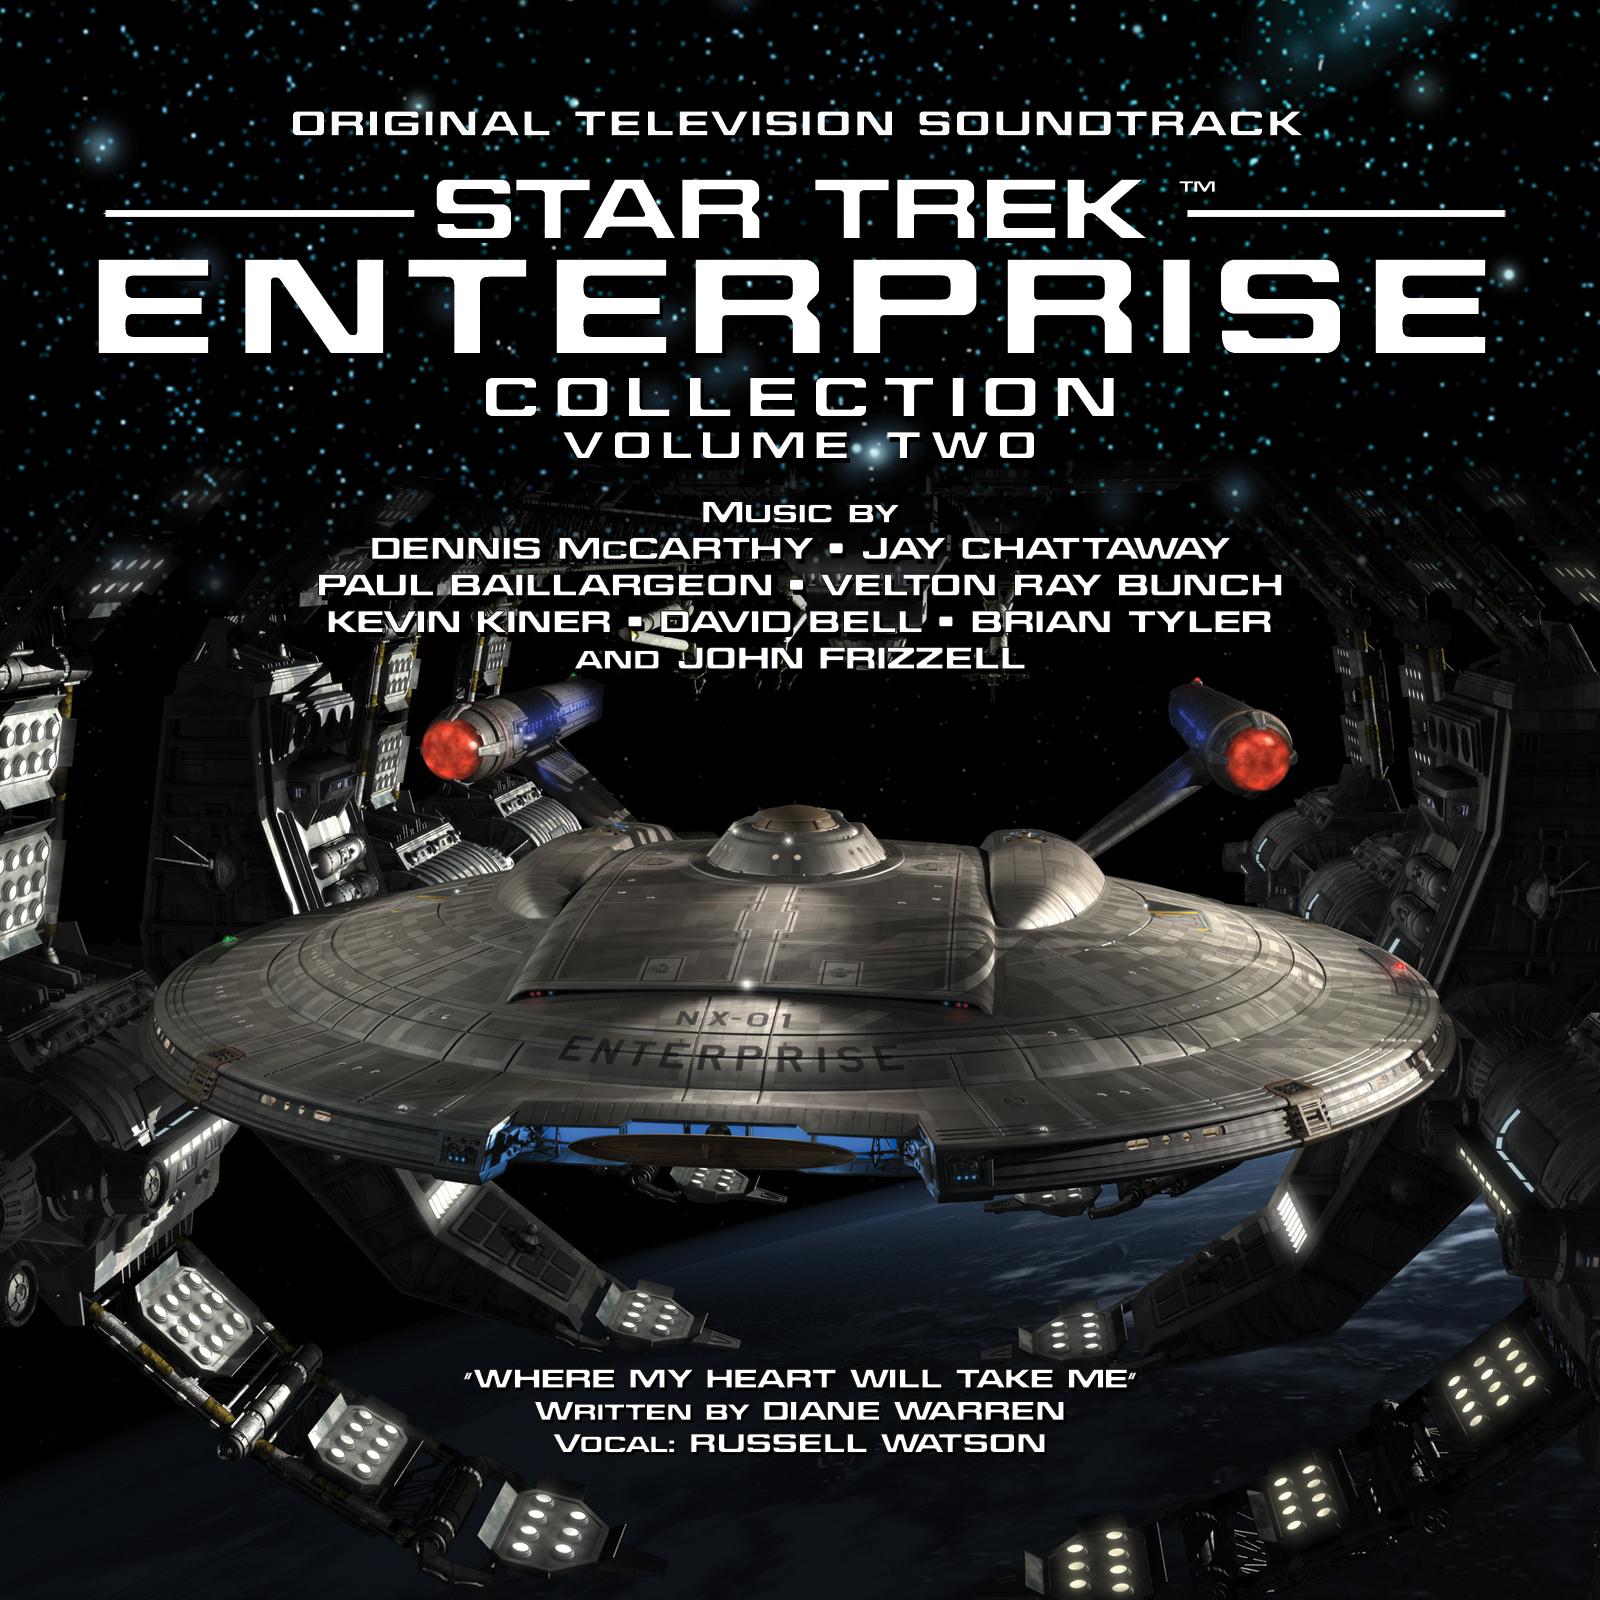 Star Trek: Enterprise Collection - Volume Two